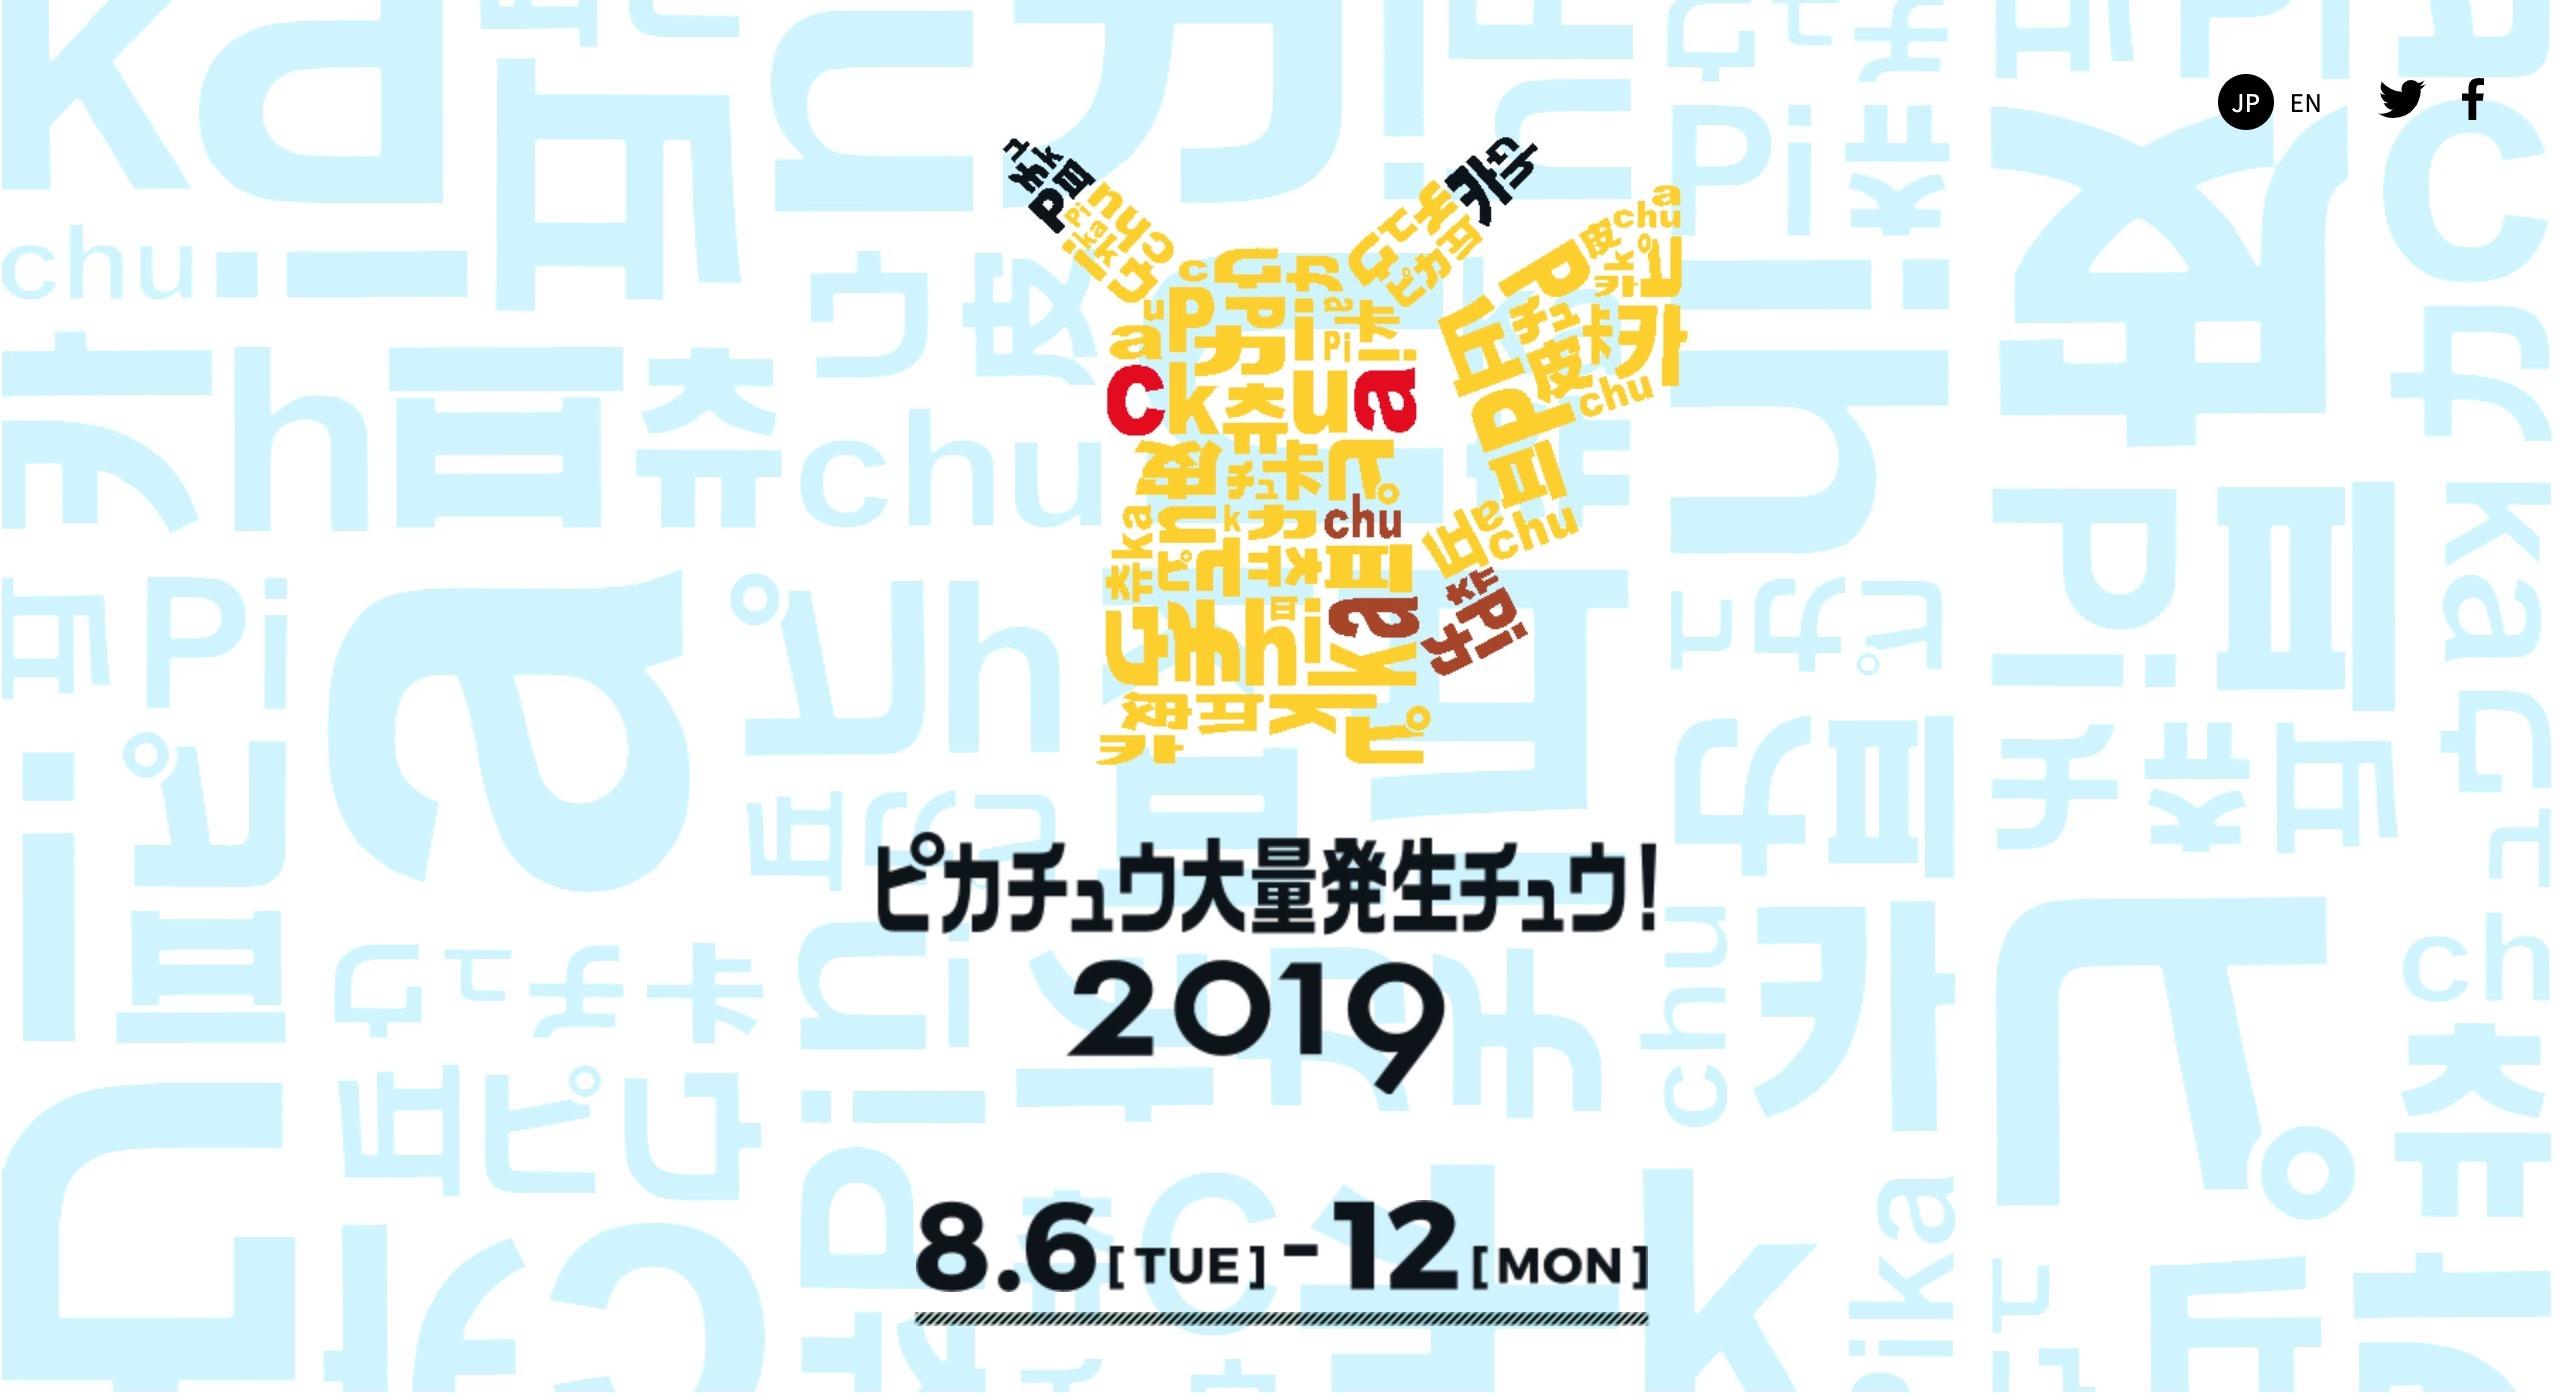 「Pokémon GO Fest」が日本で初開催決定!抽選で参加可能に